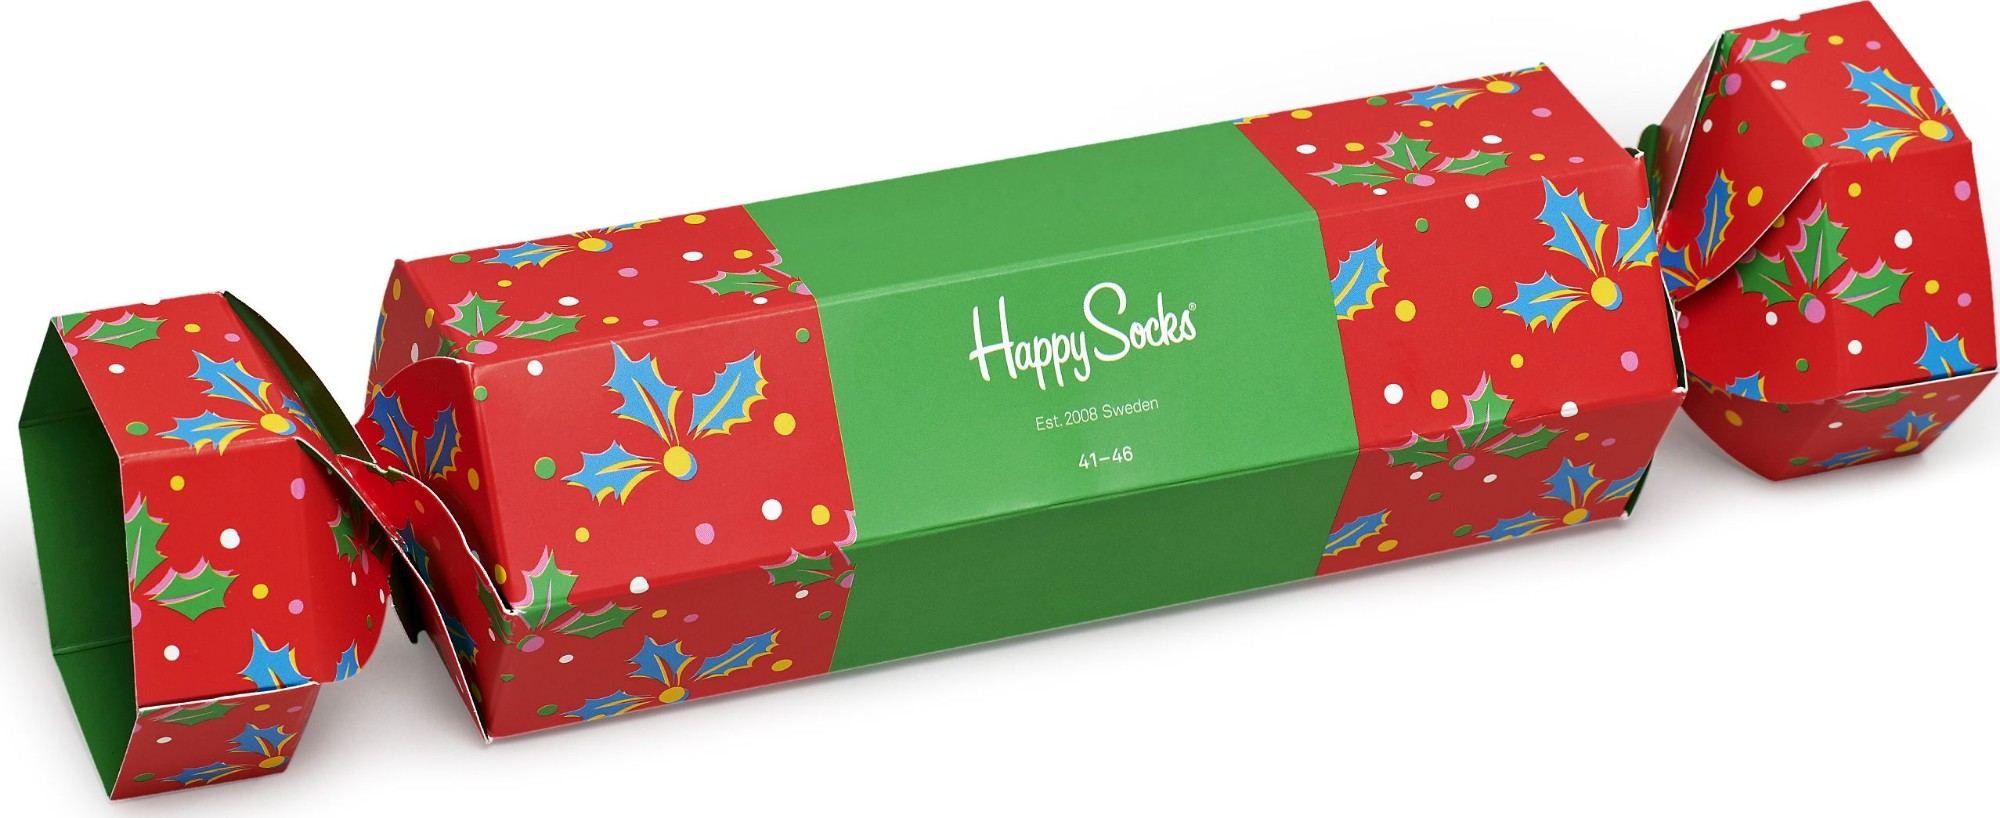 Happy Socks Christmas Cracker Holly Gift Box Multi 4300 41-46